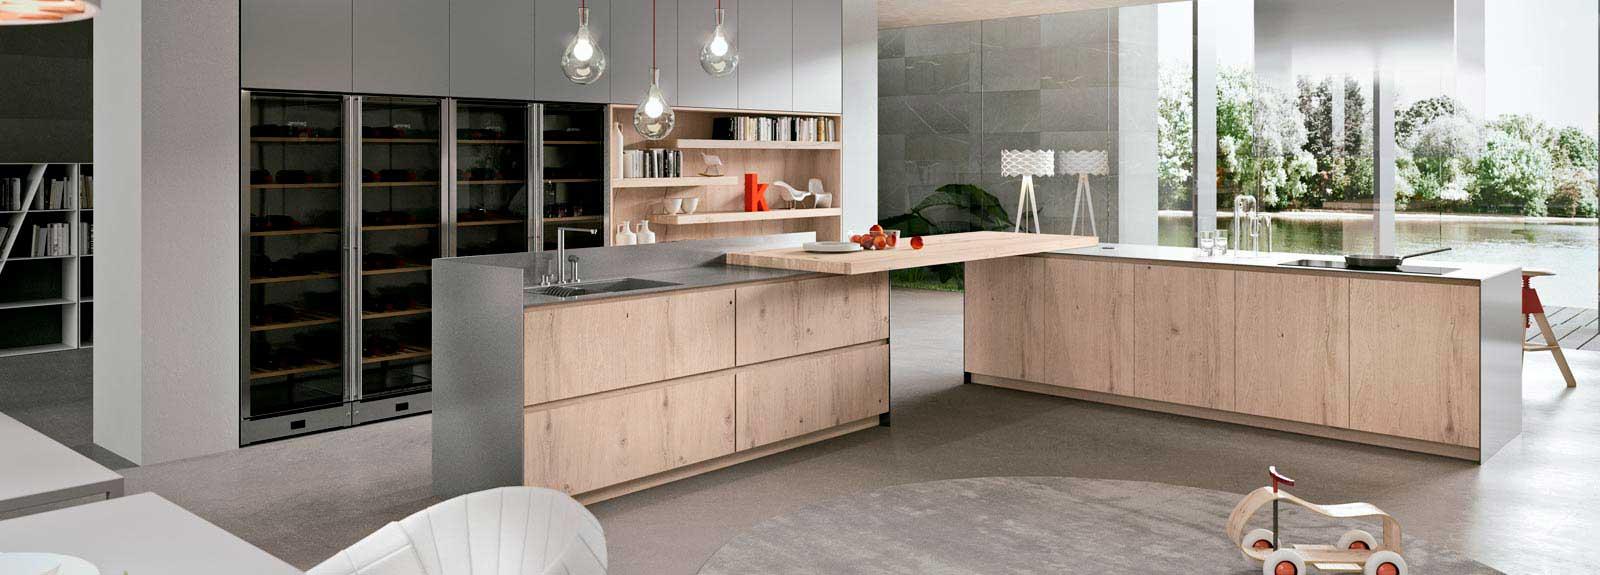 muebles-cocina-murcia-stancia-2